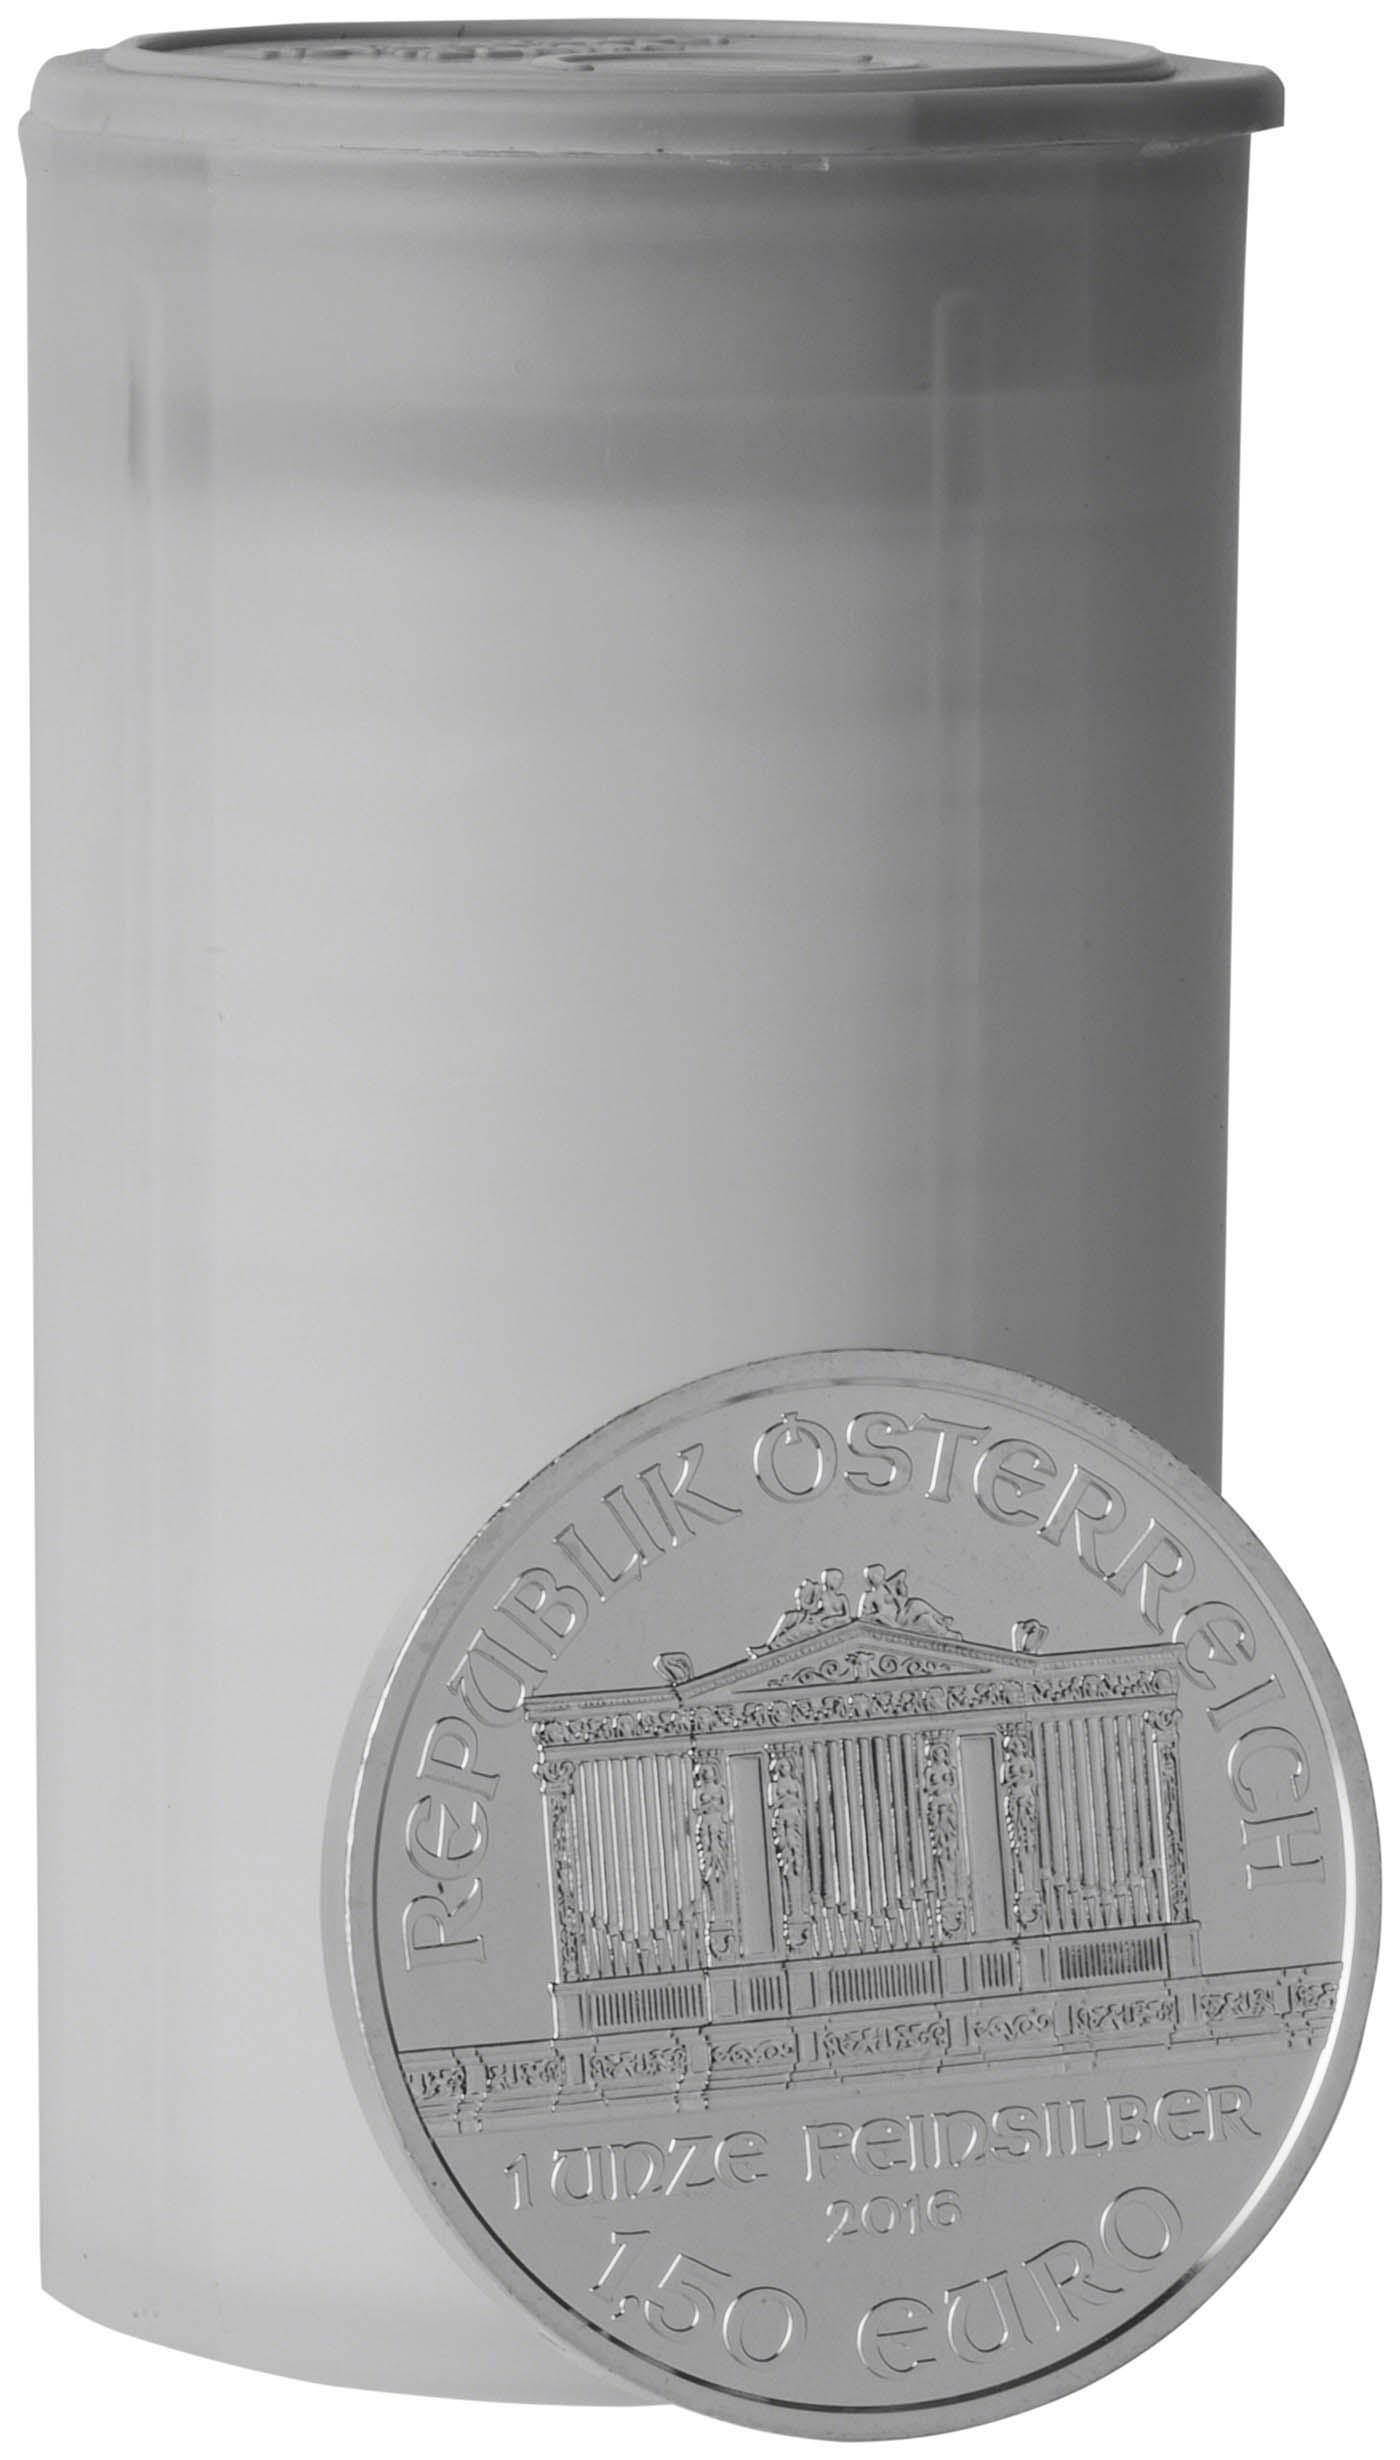 2020 Austria Mint 1 oz Silver BU Philharmonic Round Bullion Coin F//Mint Tube